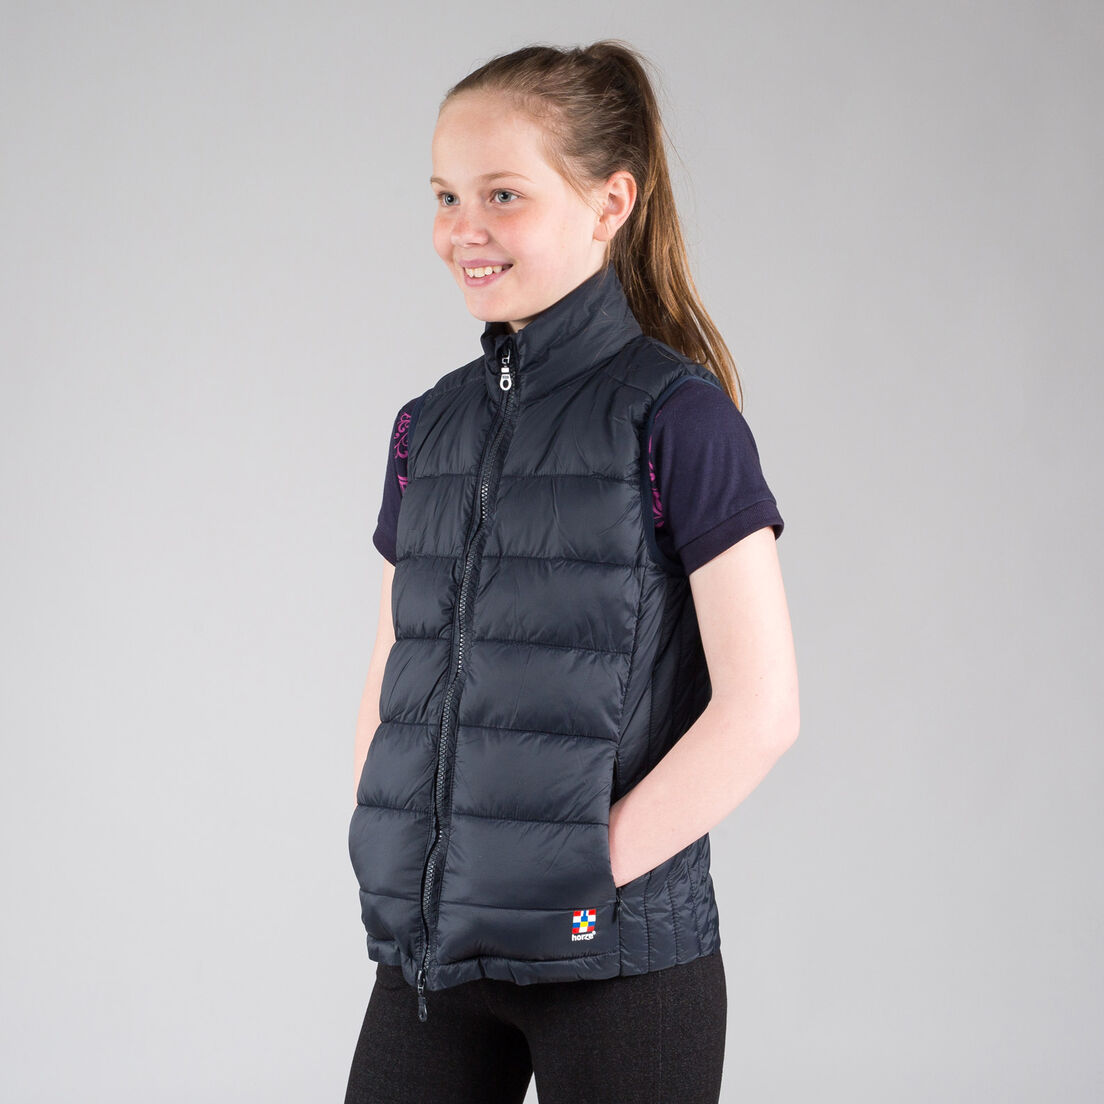 Horze Ladies Kids Navy Blue Burgundy Padded Winter Repelling Riding Vest Coat